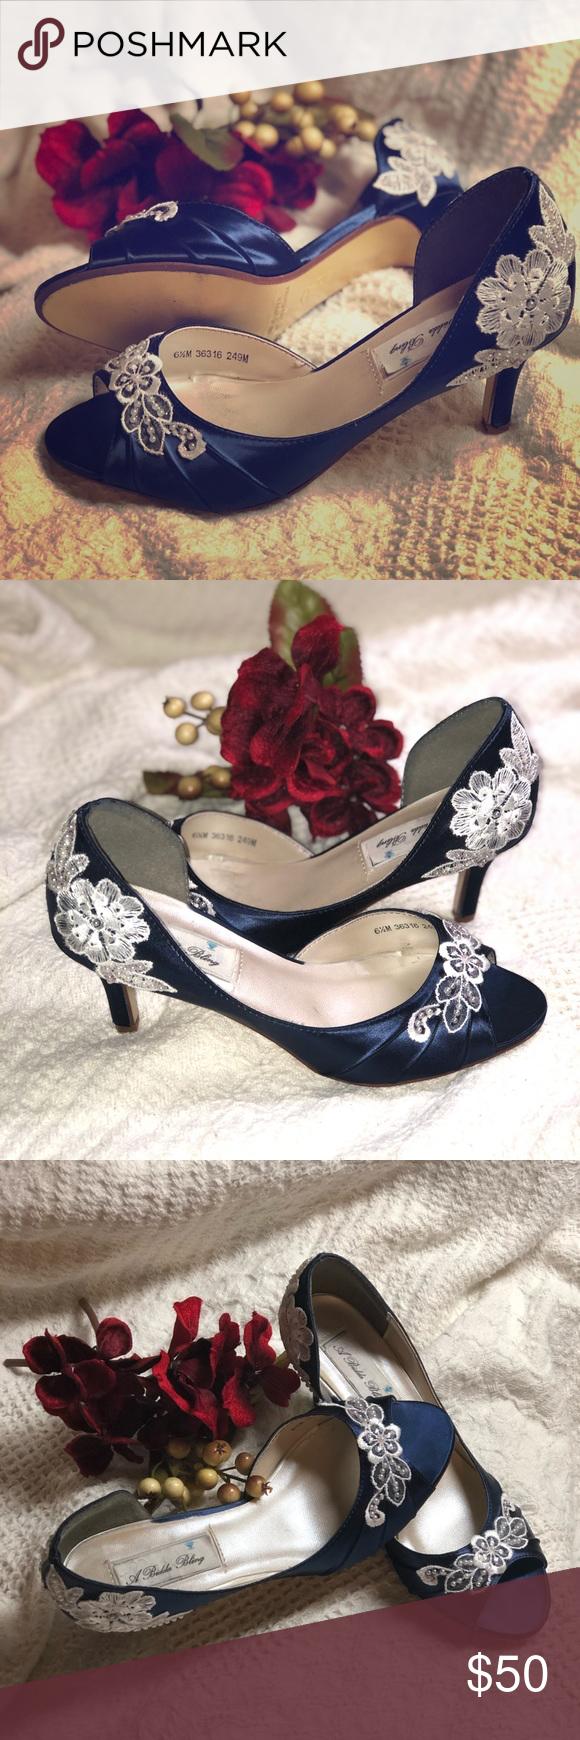 Vintage Satin Navy Blue Peep Toe Heels Shoes Heels Vintage Custom Shoes Heels Navy Blue Heels